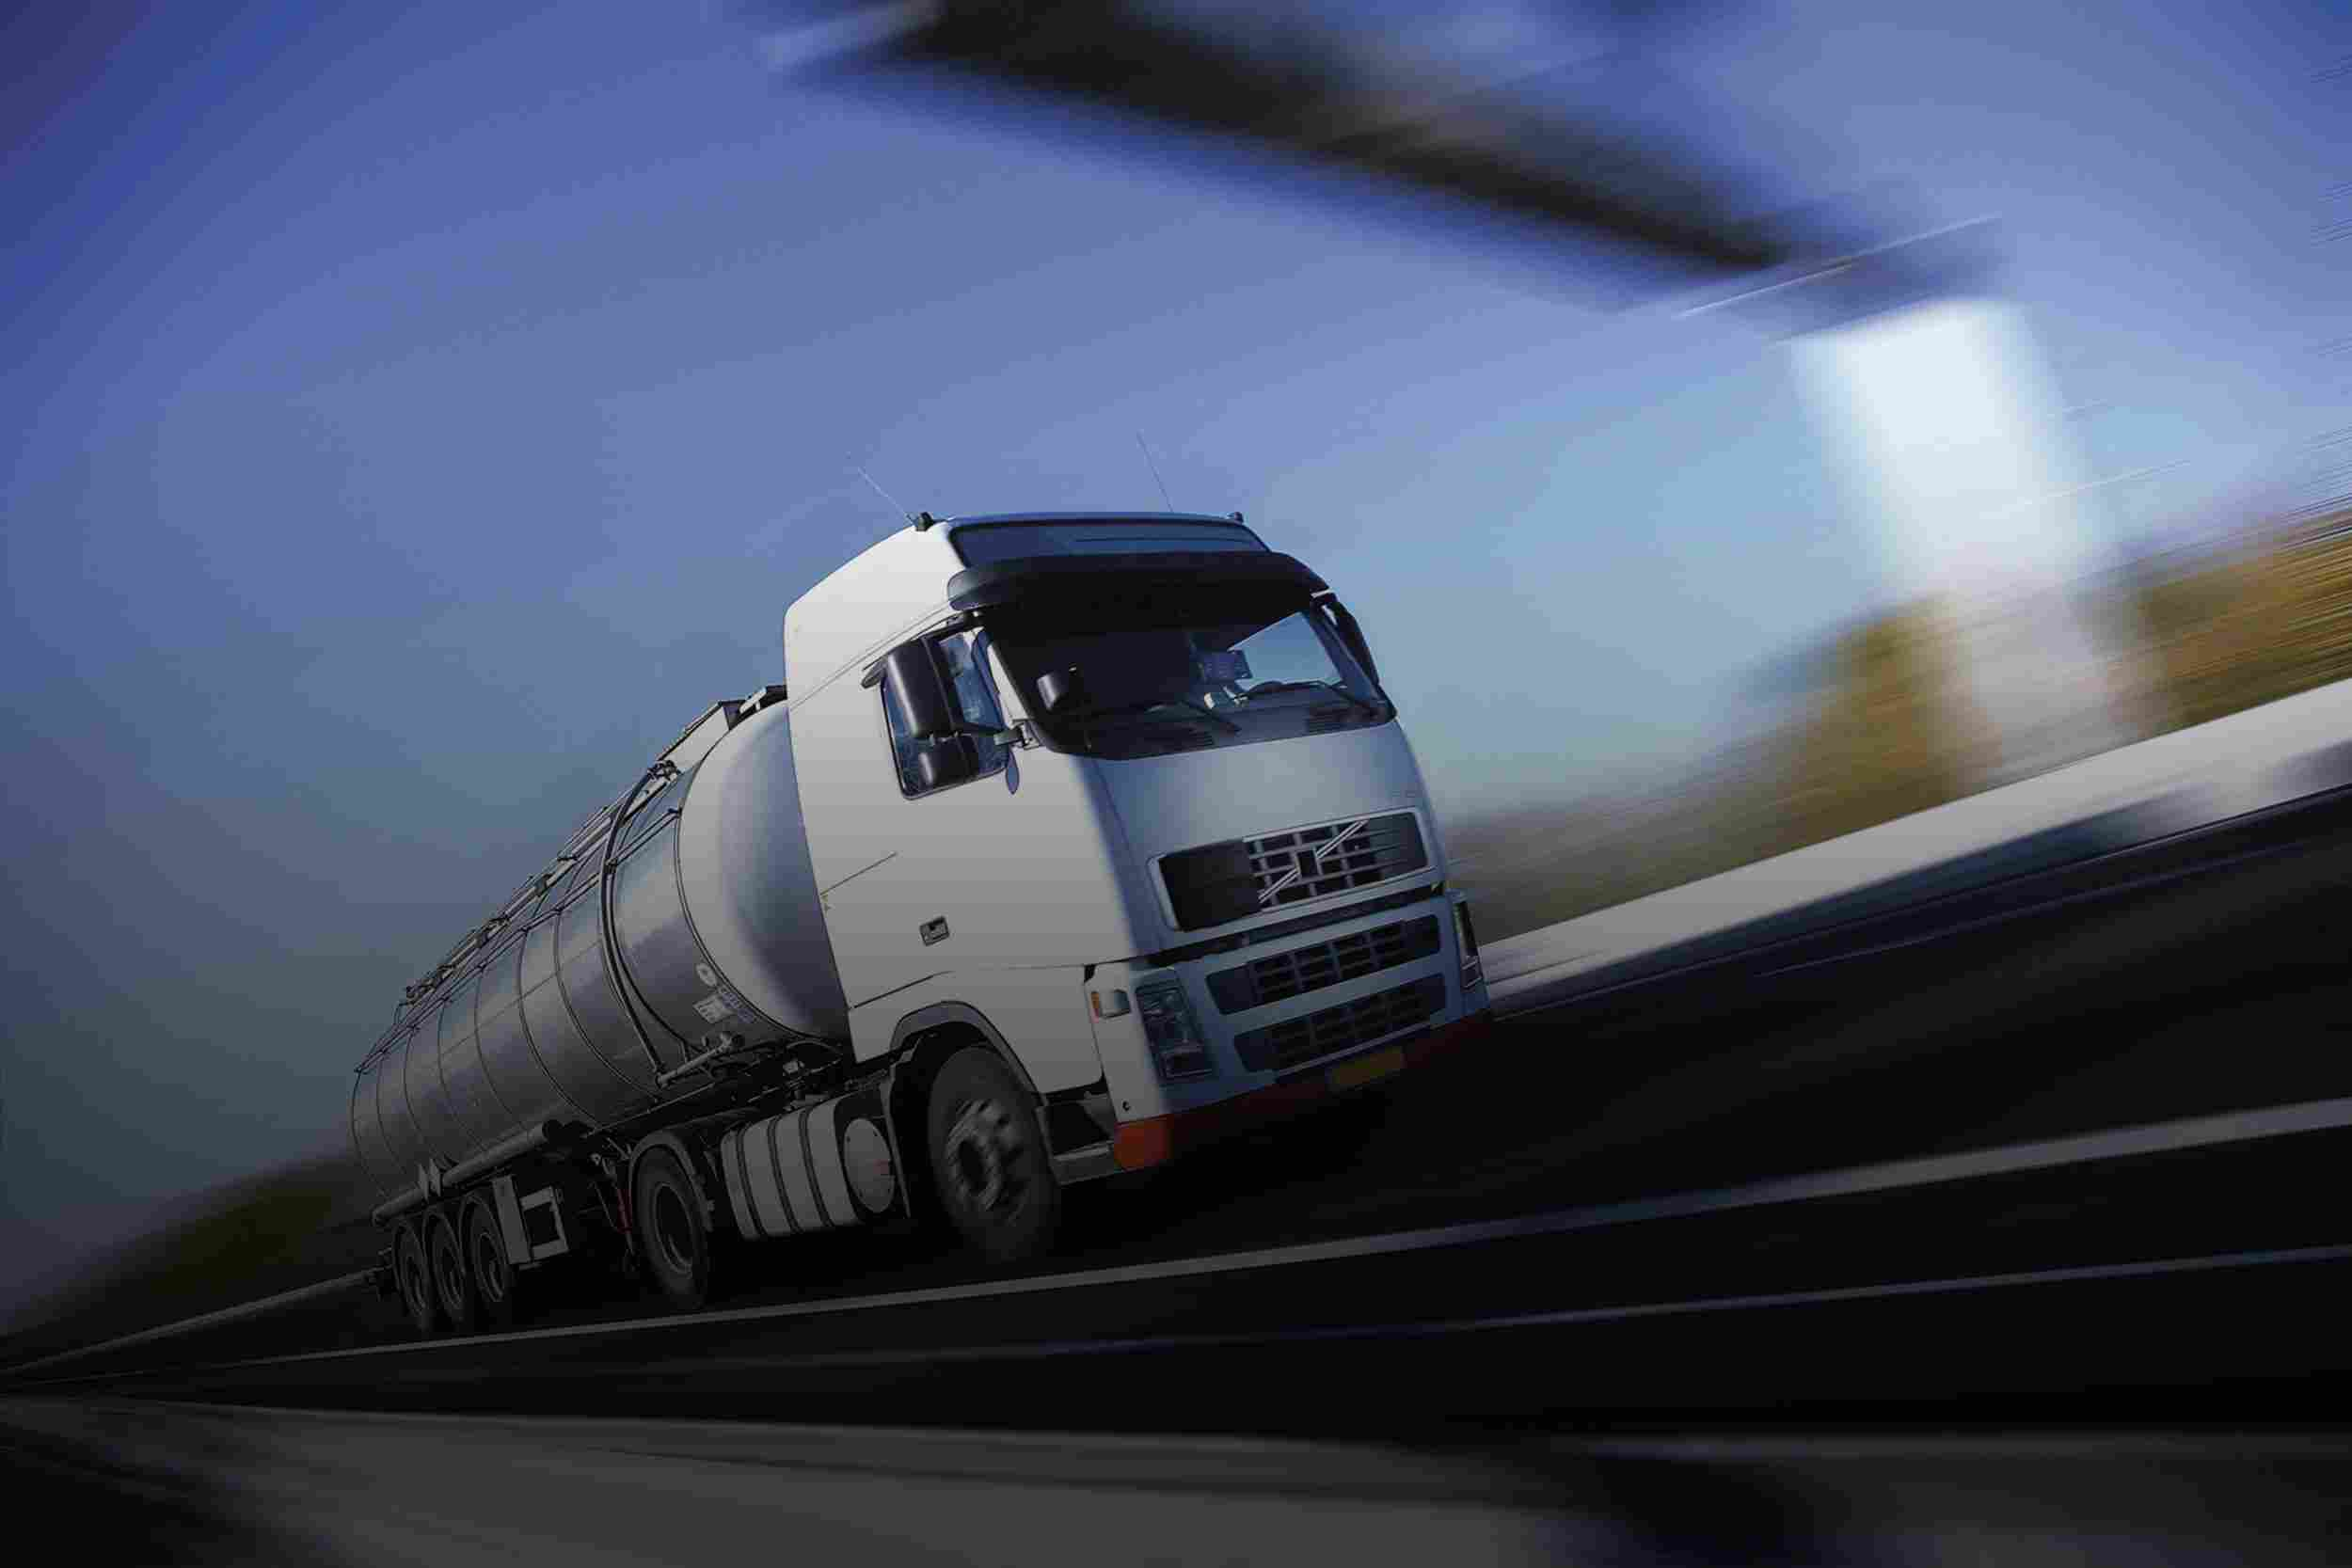 https://euro-cargo.eu/wp-content/uploads/2015/09/White-Truck-single.jpg